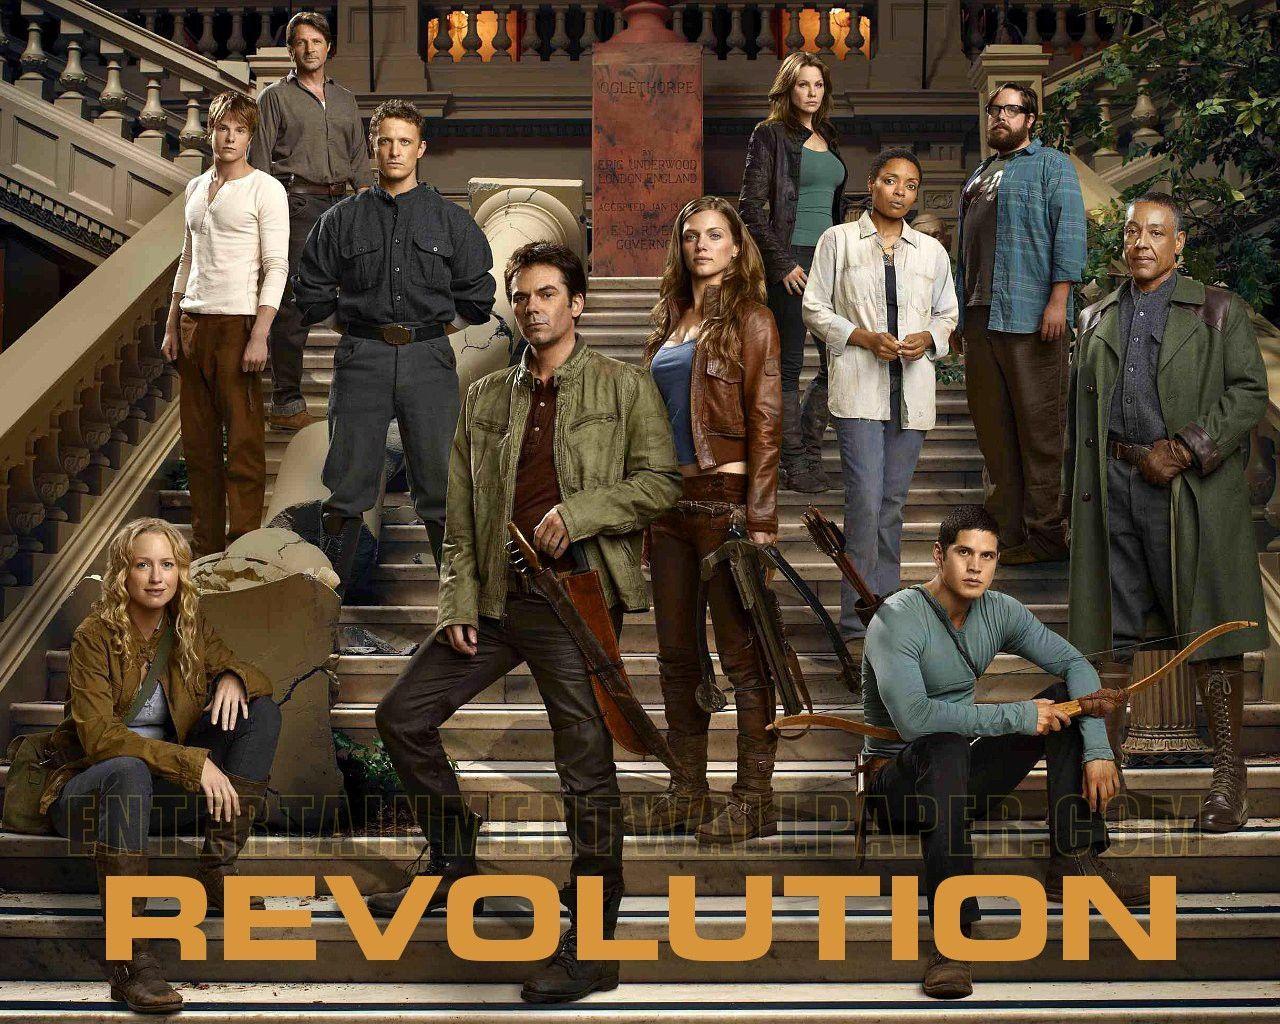 Revolution Tv Series Wallpapers: TV Series Wallpapers